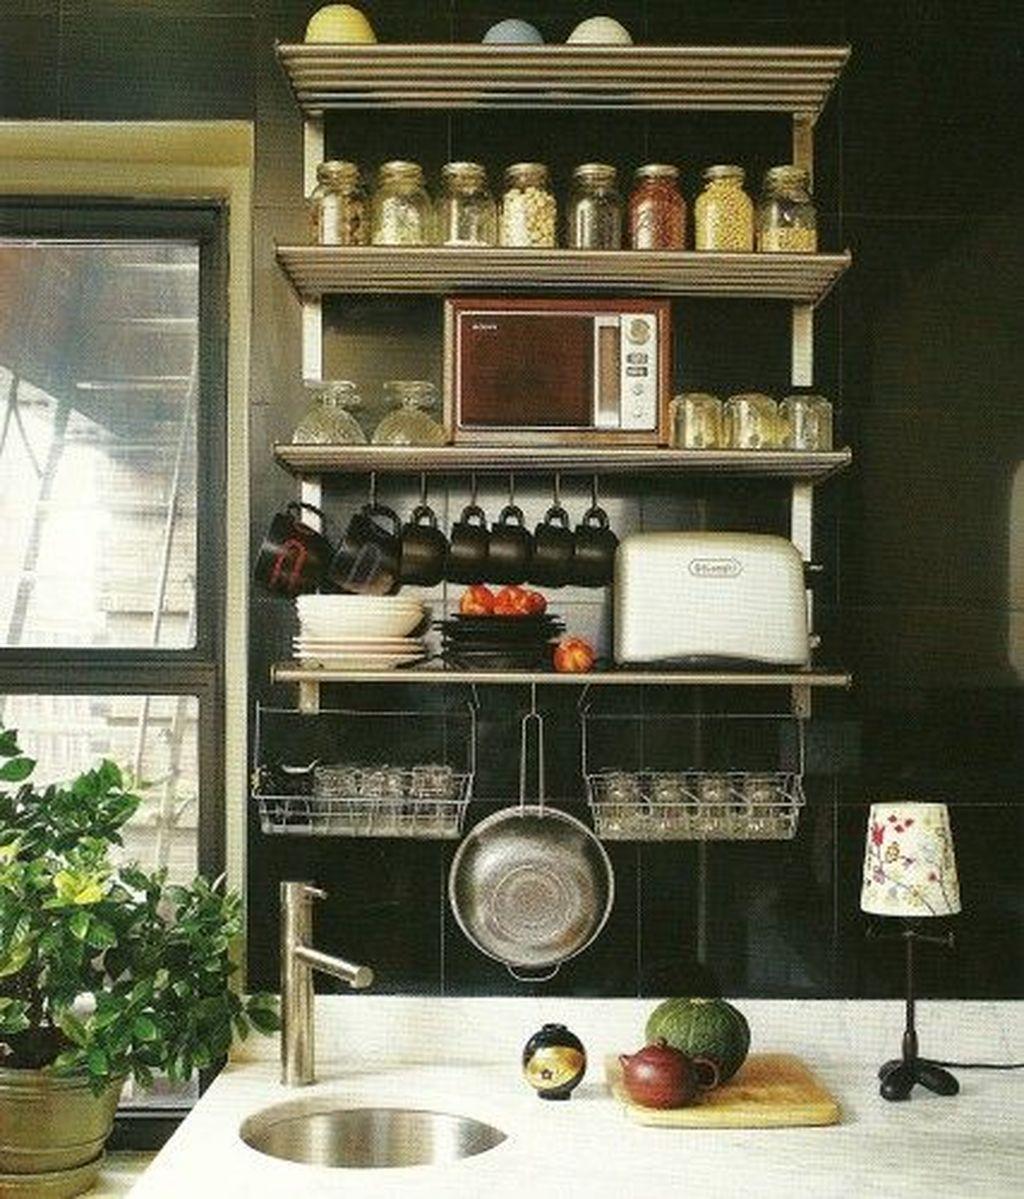 Decoomo - Trends Home Decoration Ideas | Small kitchen ...